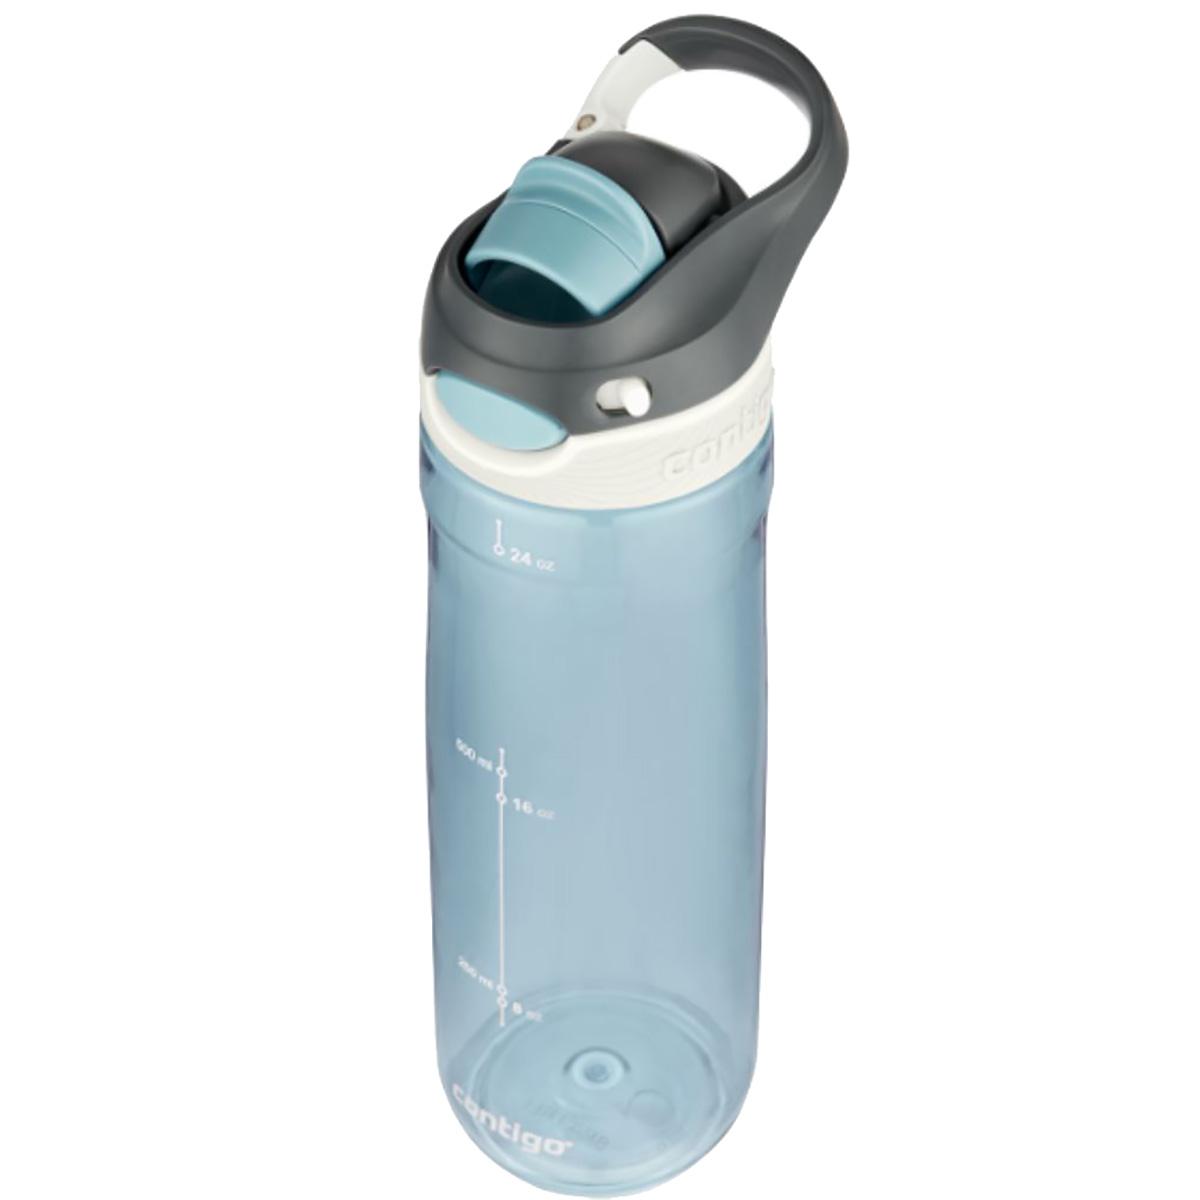 Contigo-24-oz-Chug-Autospout-Leak-Proof-Water-Bottle miniatuur 24